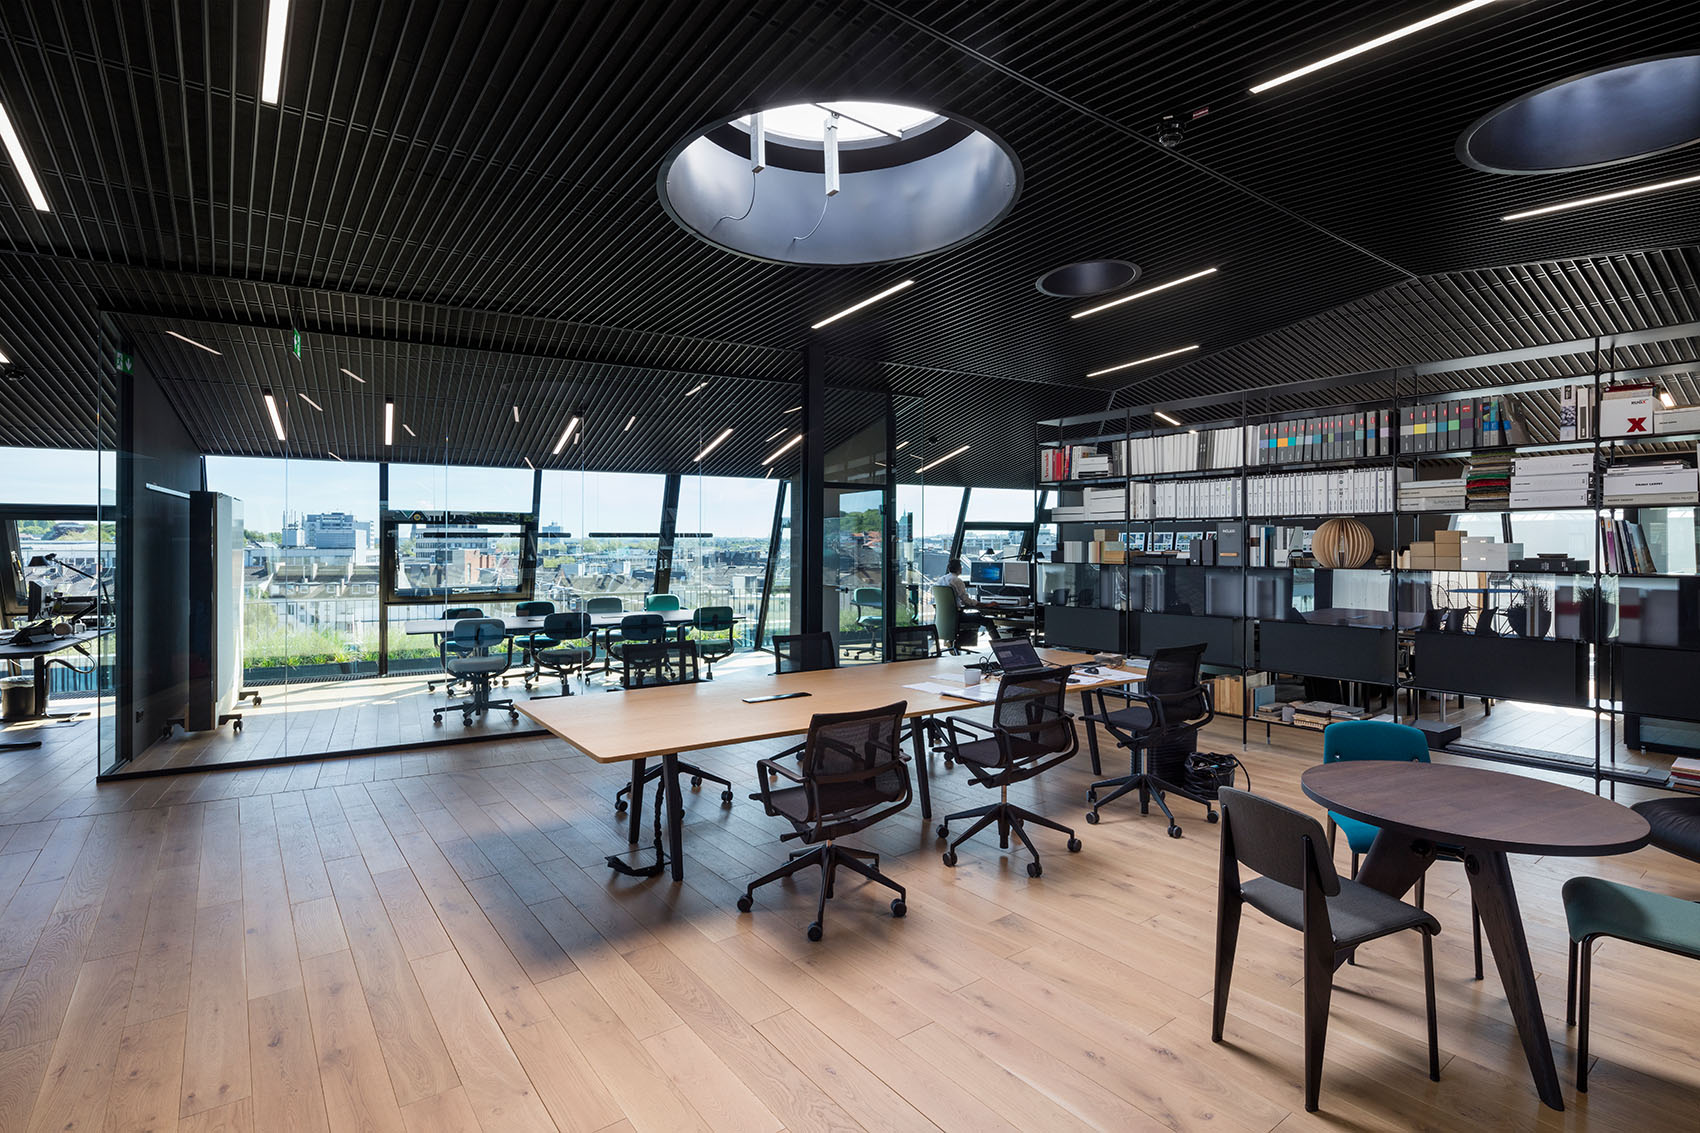 8_0_Rooftop-Office-Aachen_CROSS-Architecture.jpg